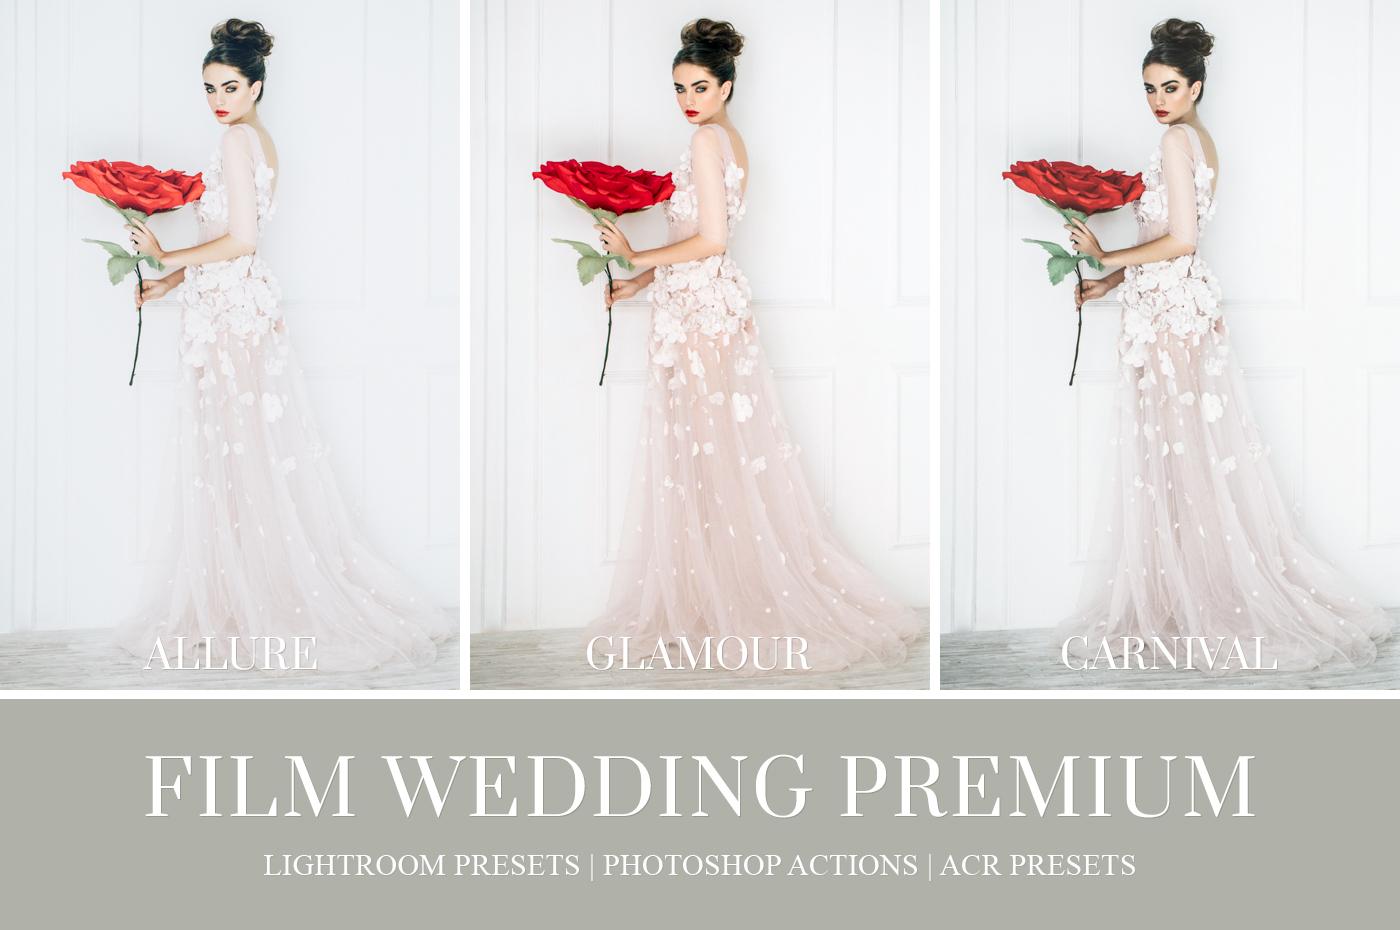 film wedding lightoom preset and ps action